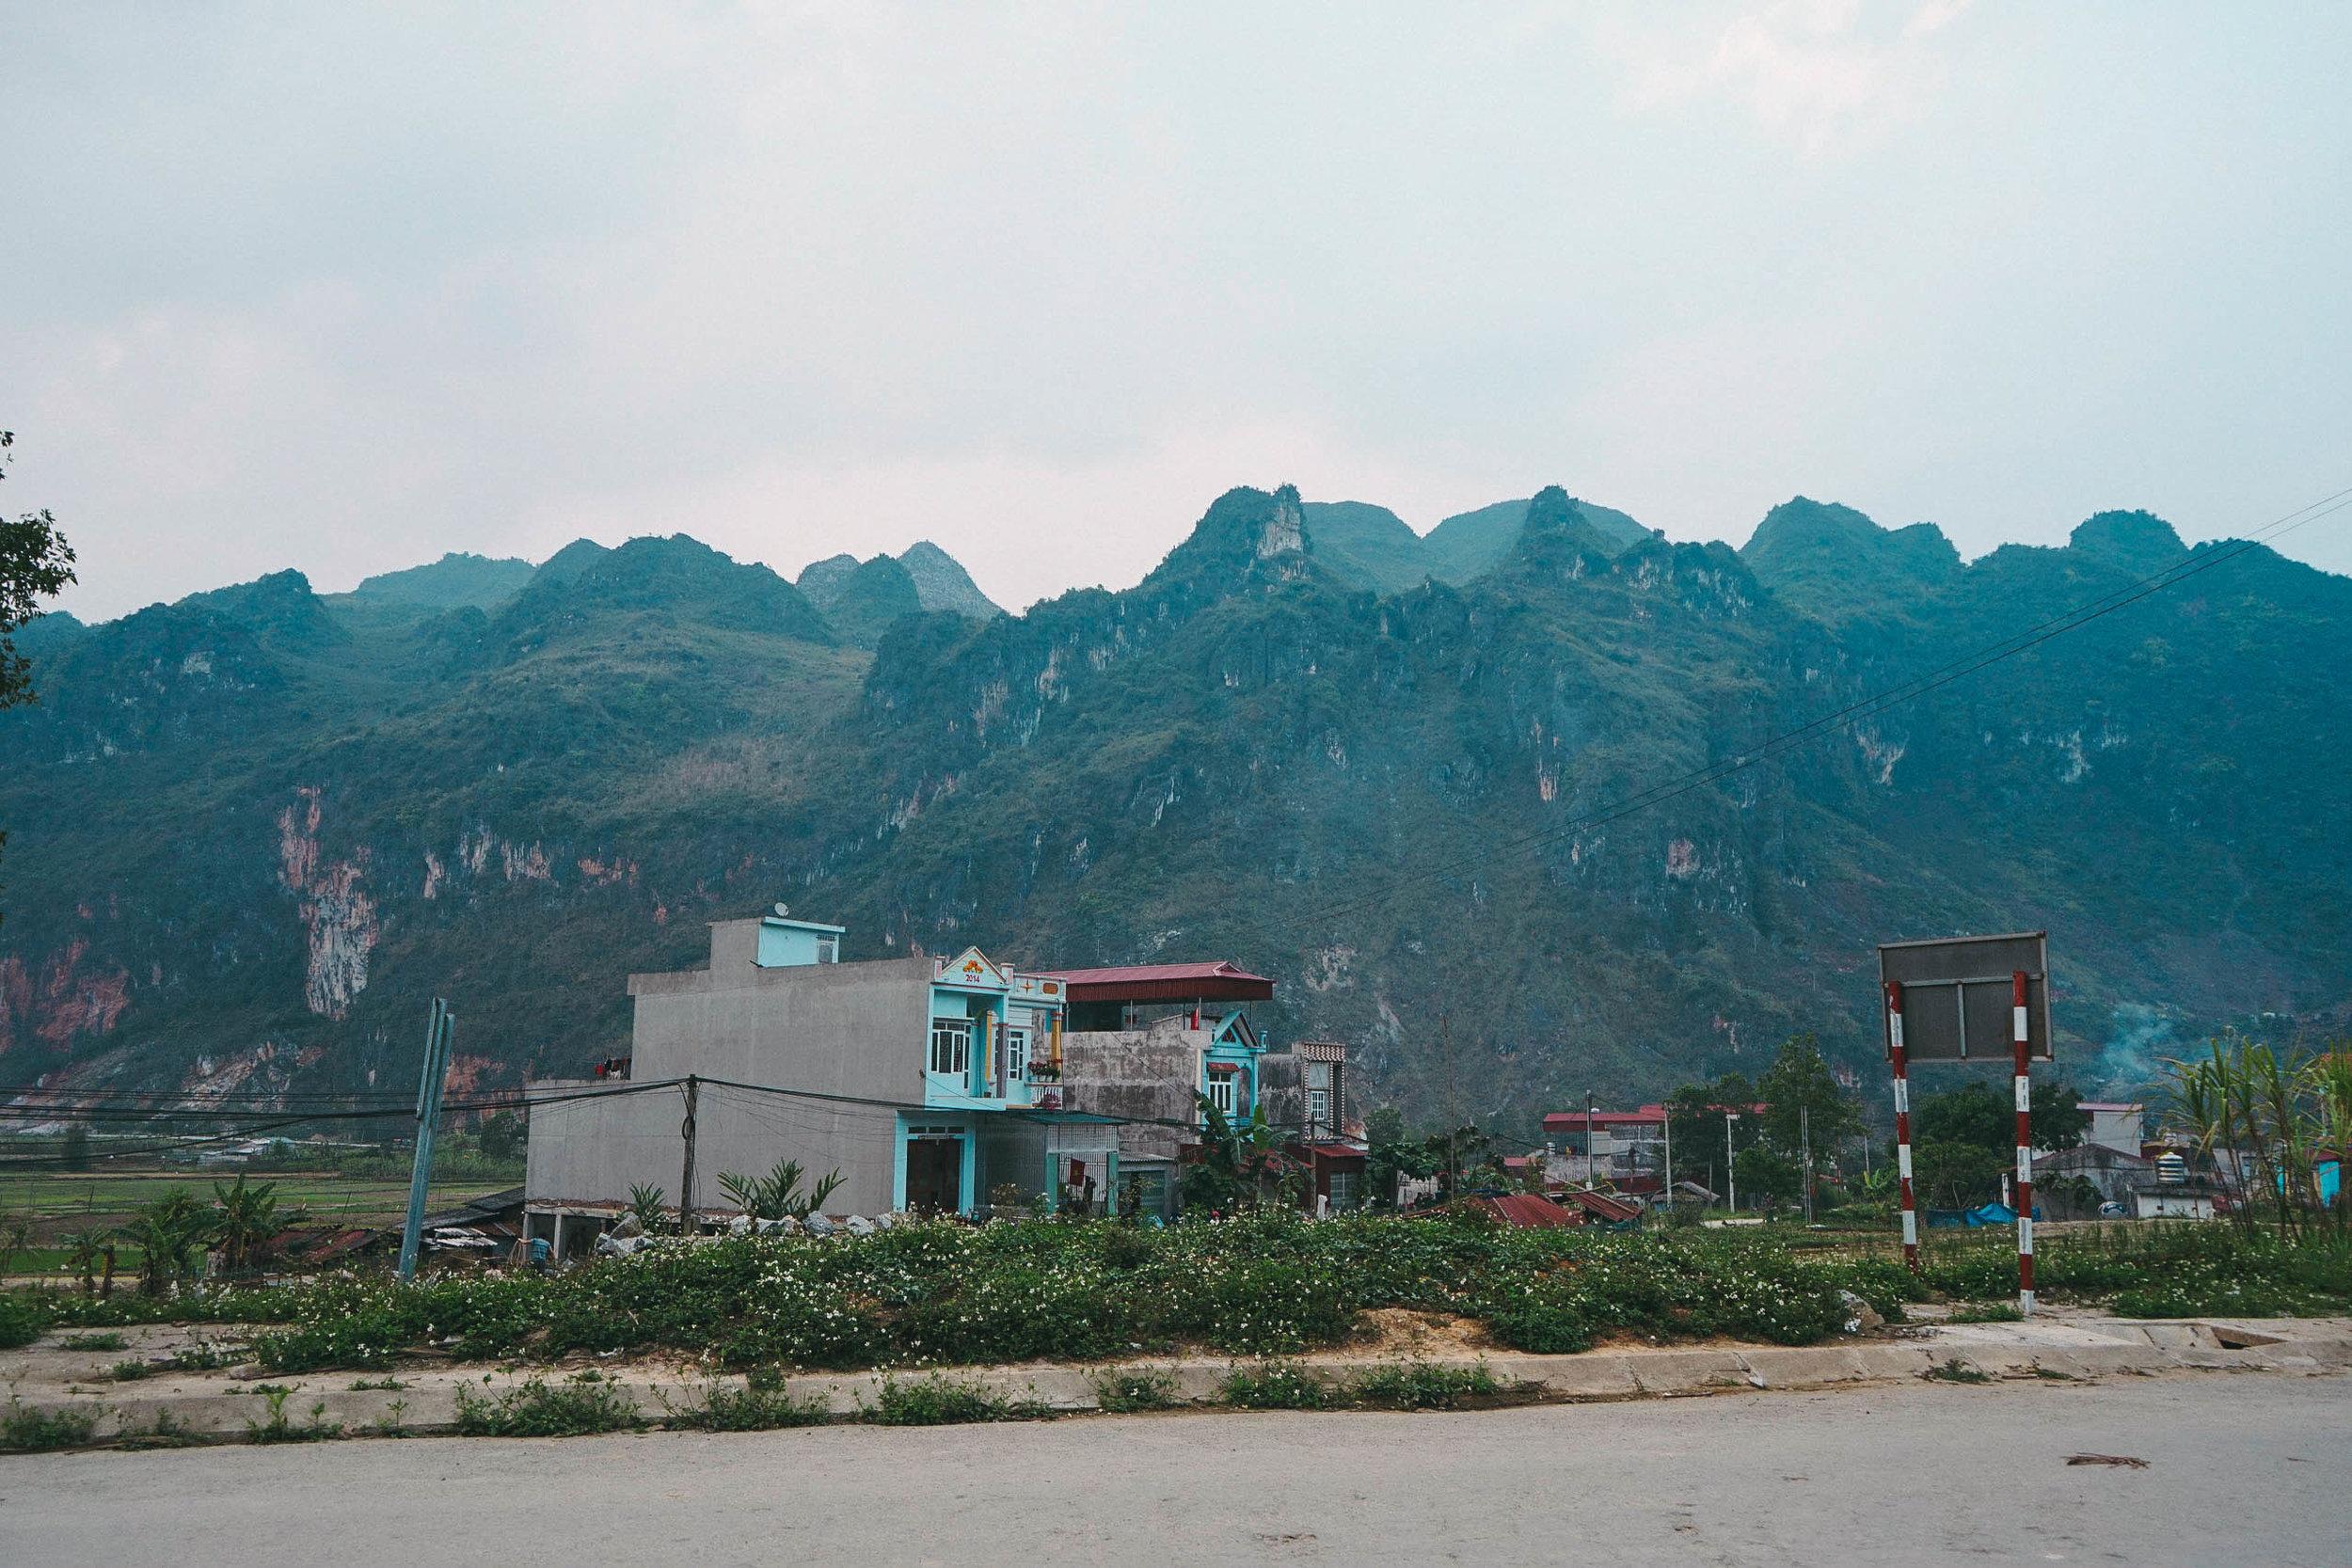 northvietnam-96.jpg